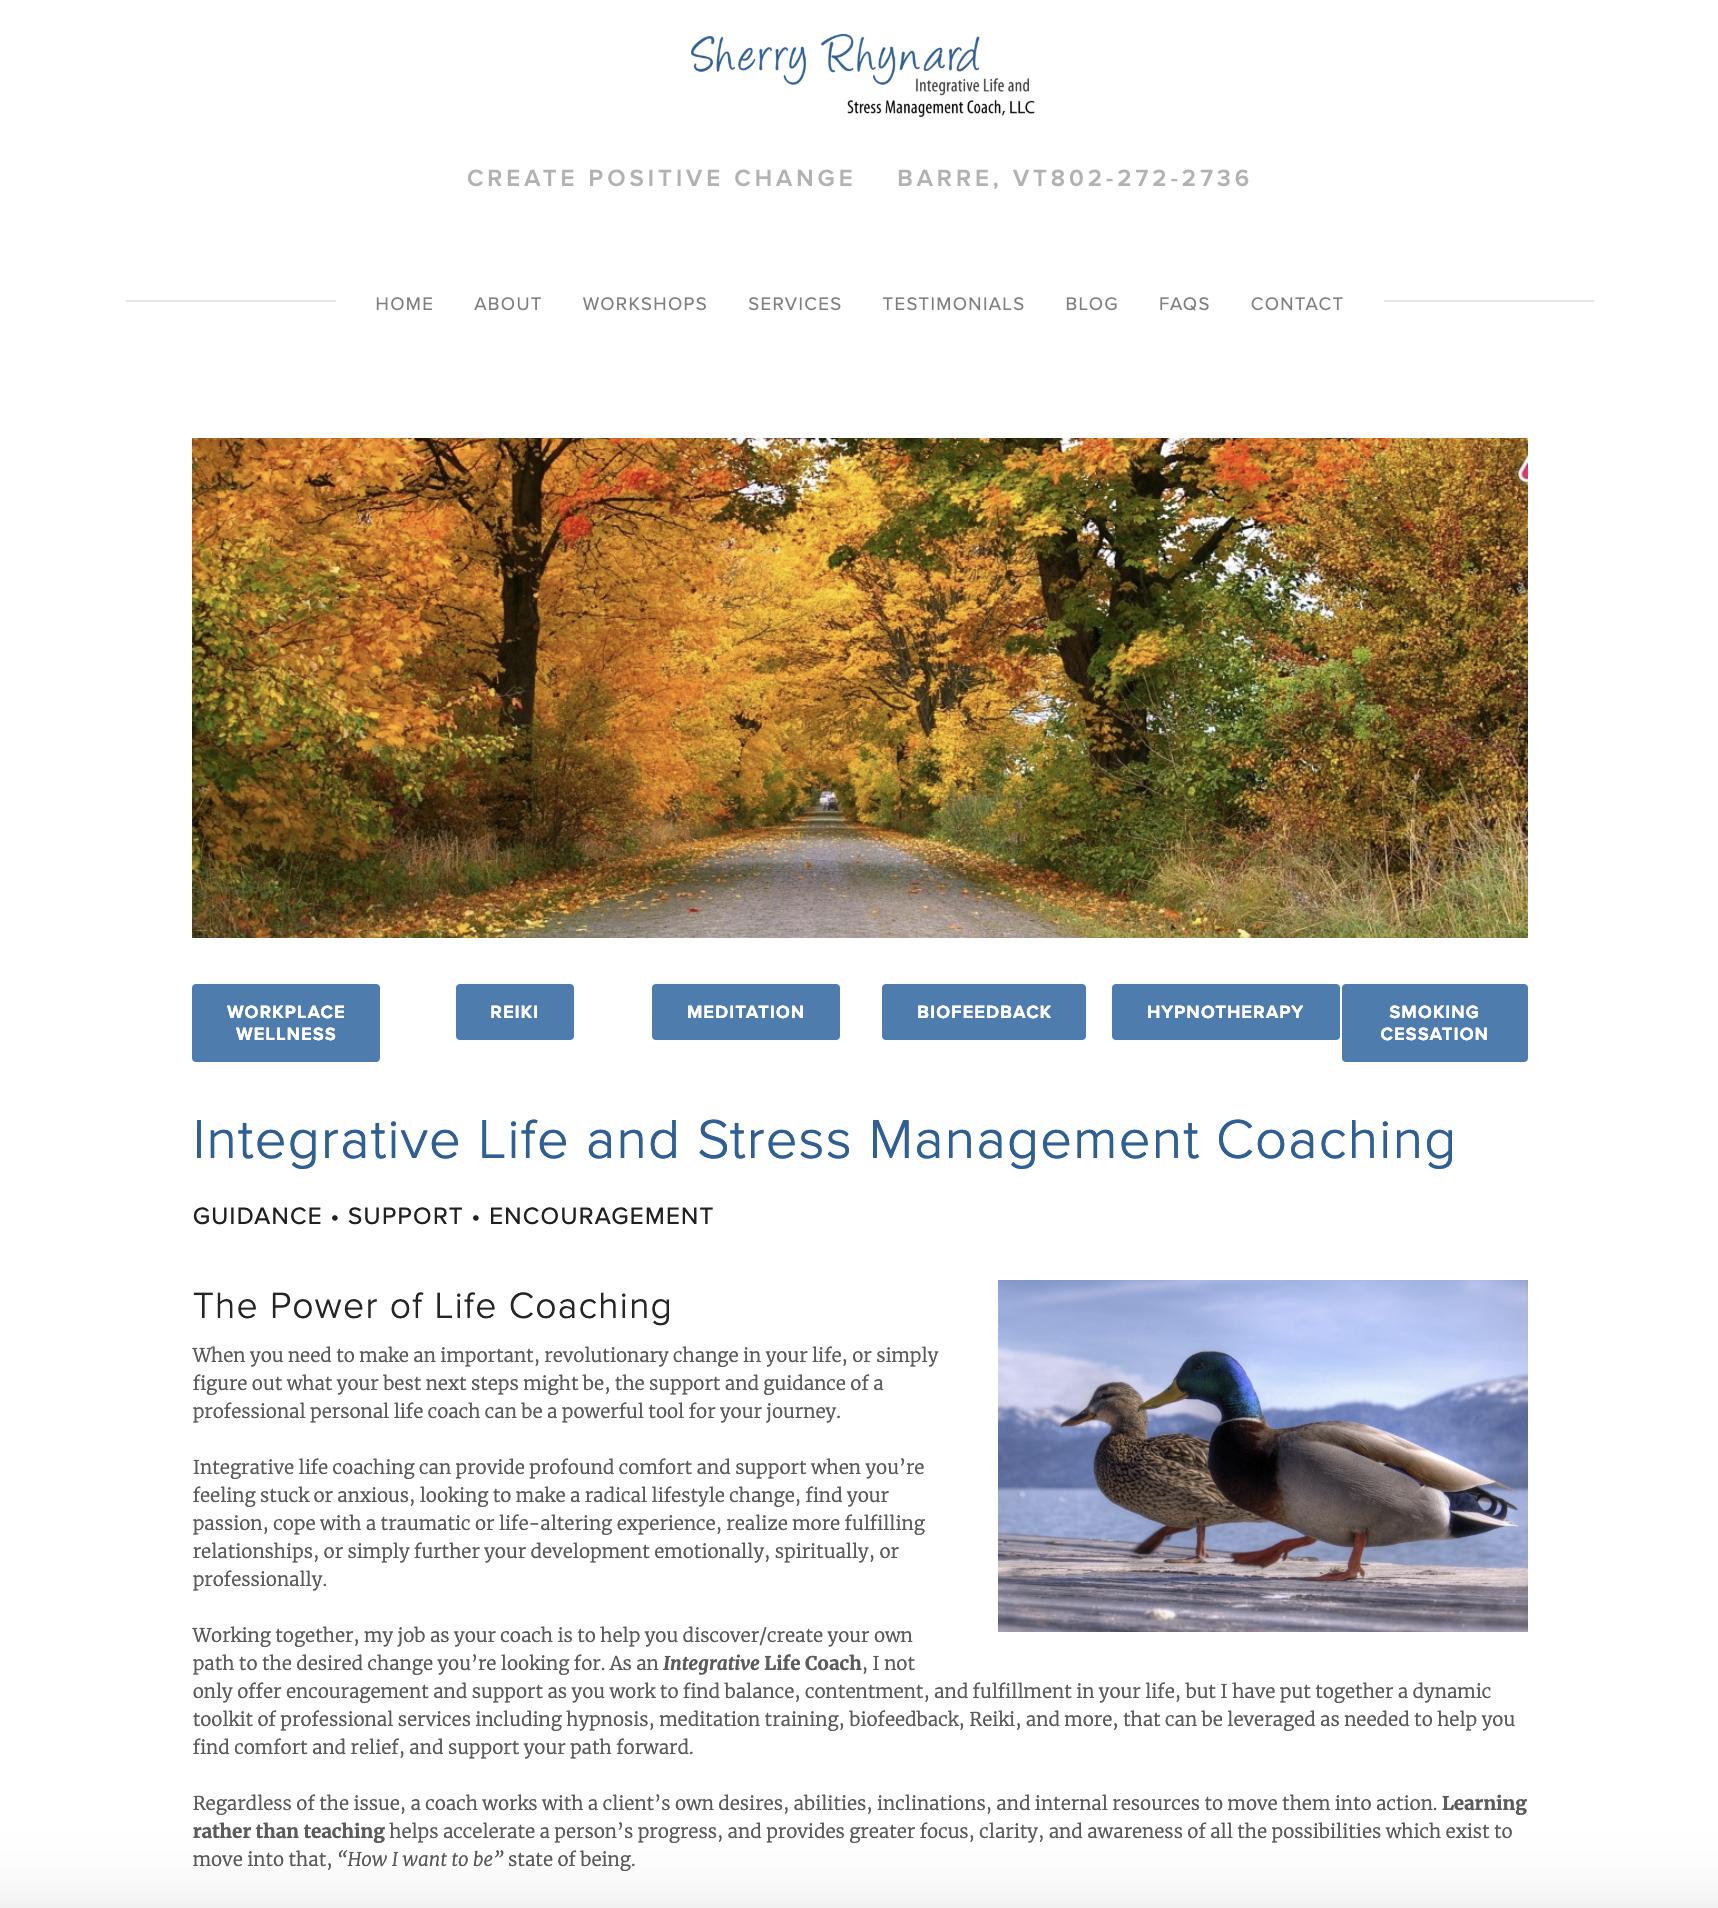 Sherry Rhynard, Integrative Life Coaching and Stress Management